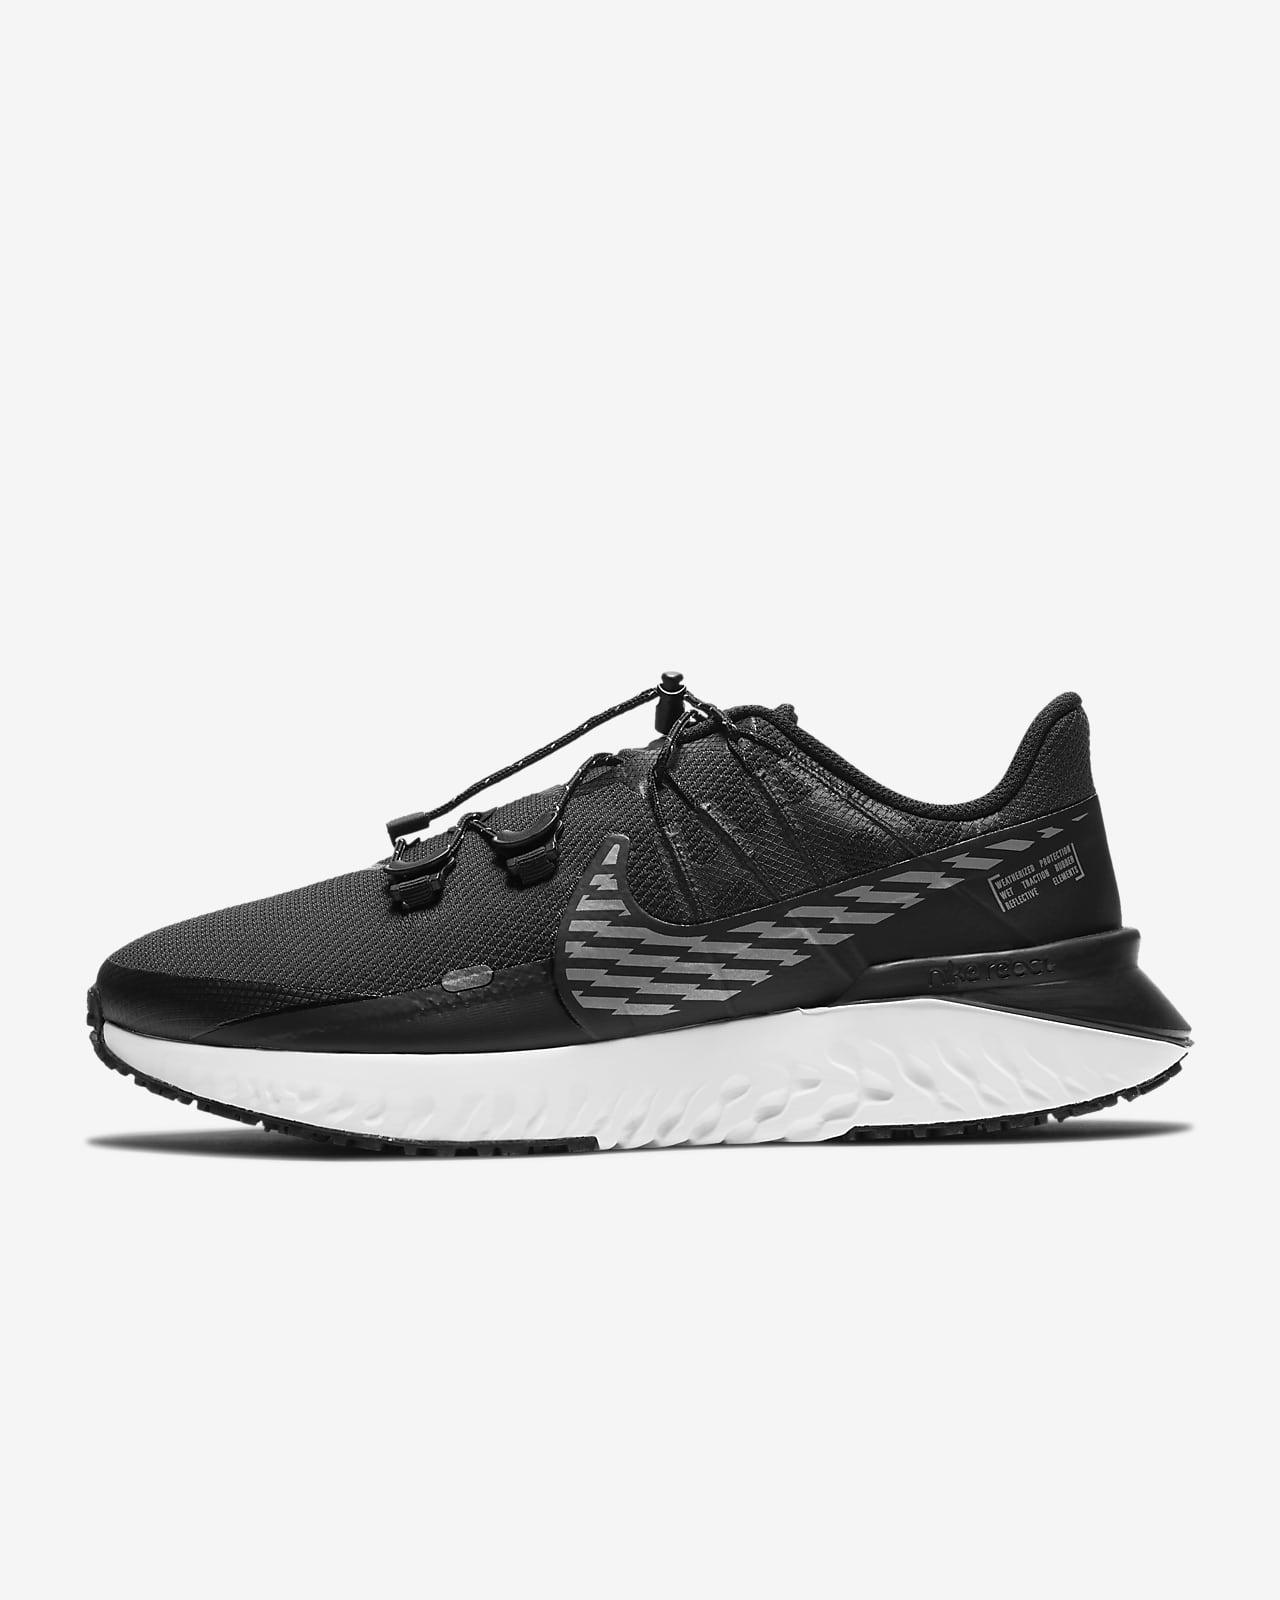 Sapatilhas de running Nike Legend React 3 Shield para mulher